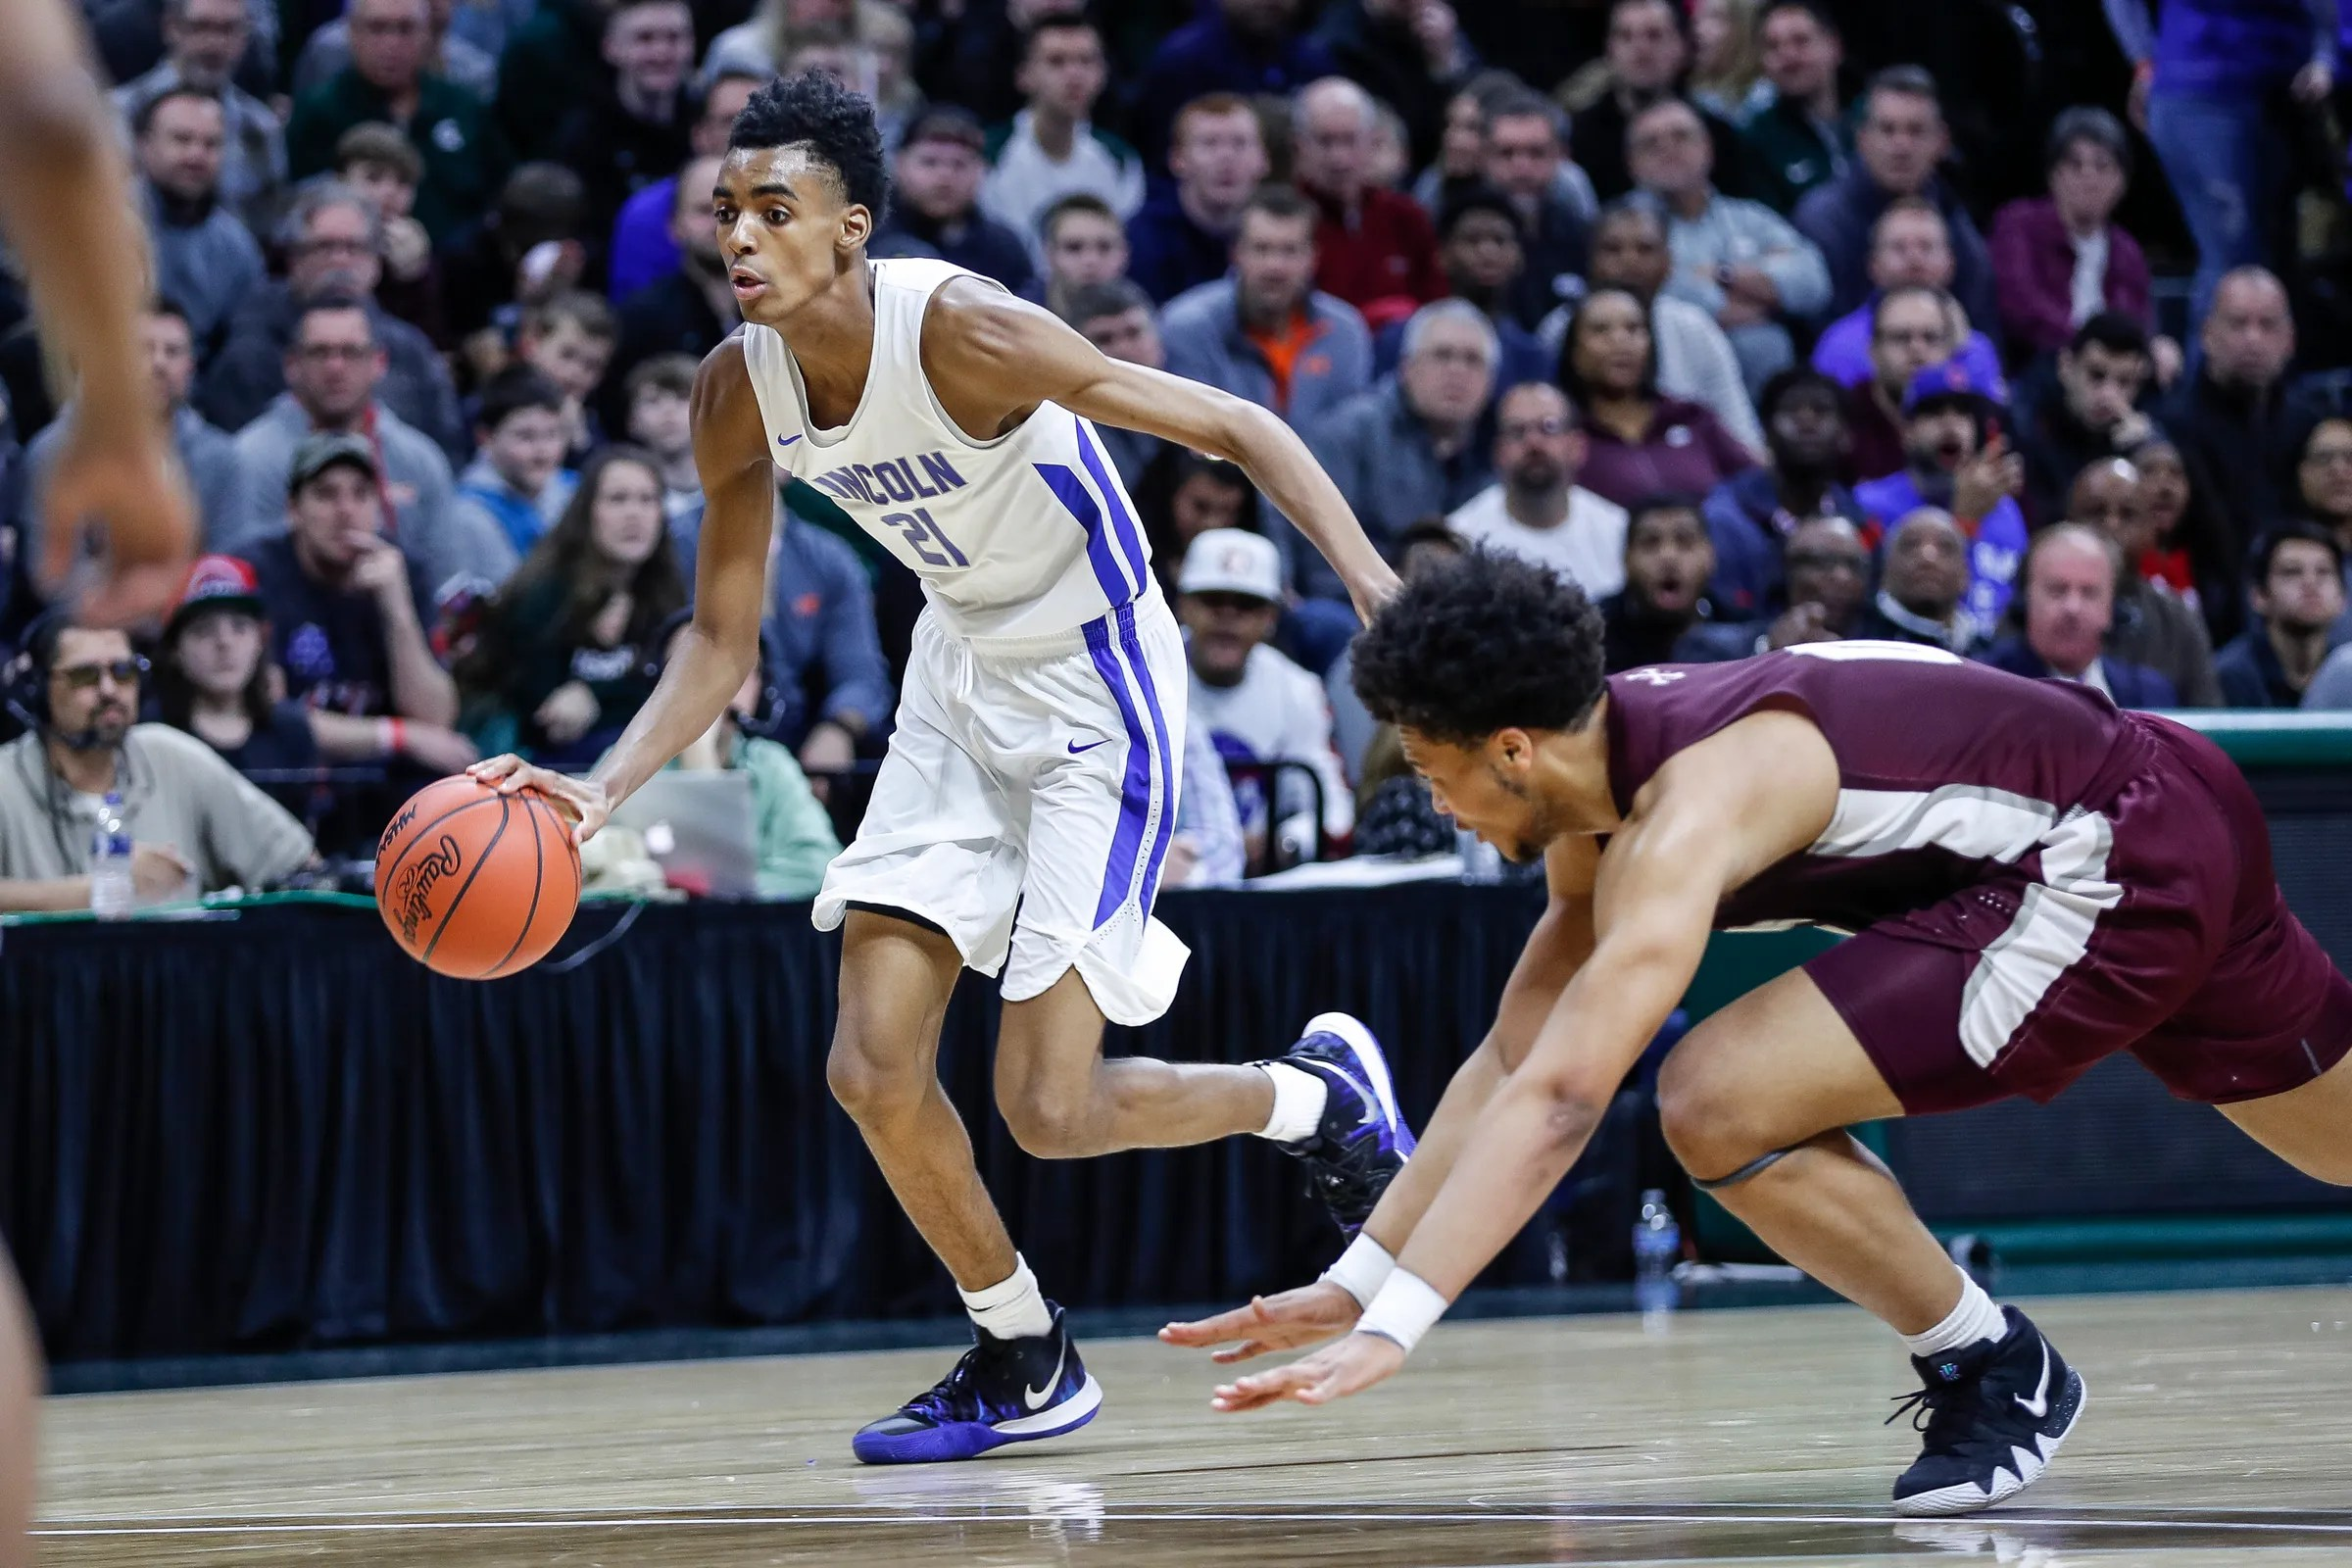 Michigan State Basketball Offers Scholarship To Phenom